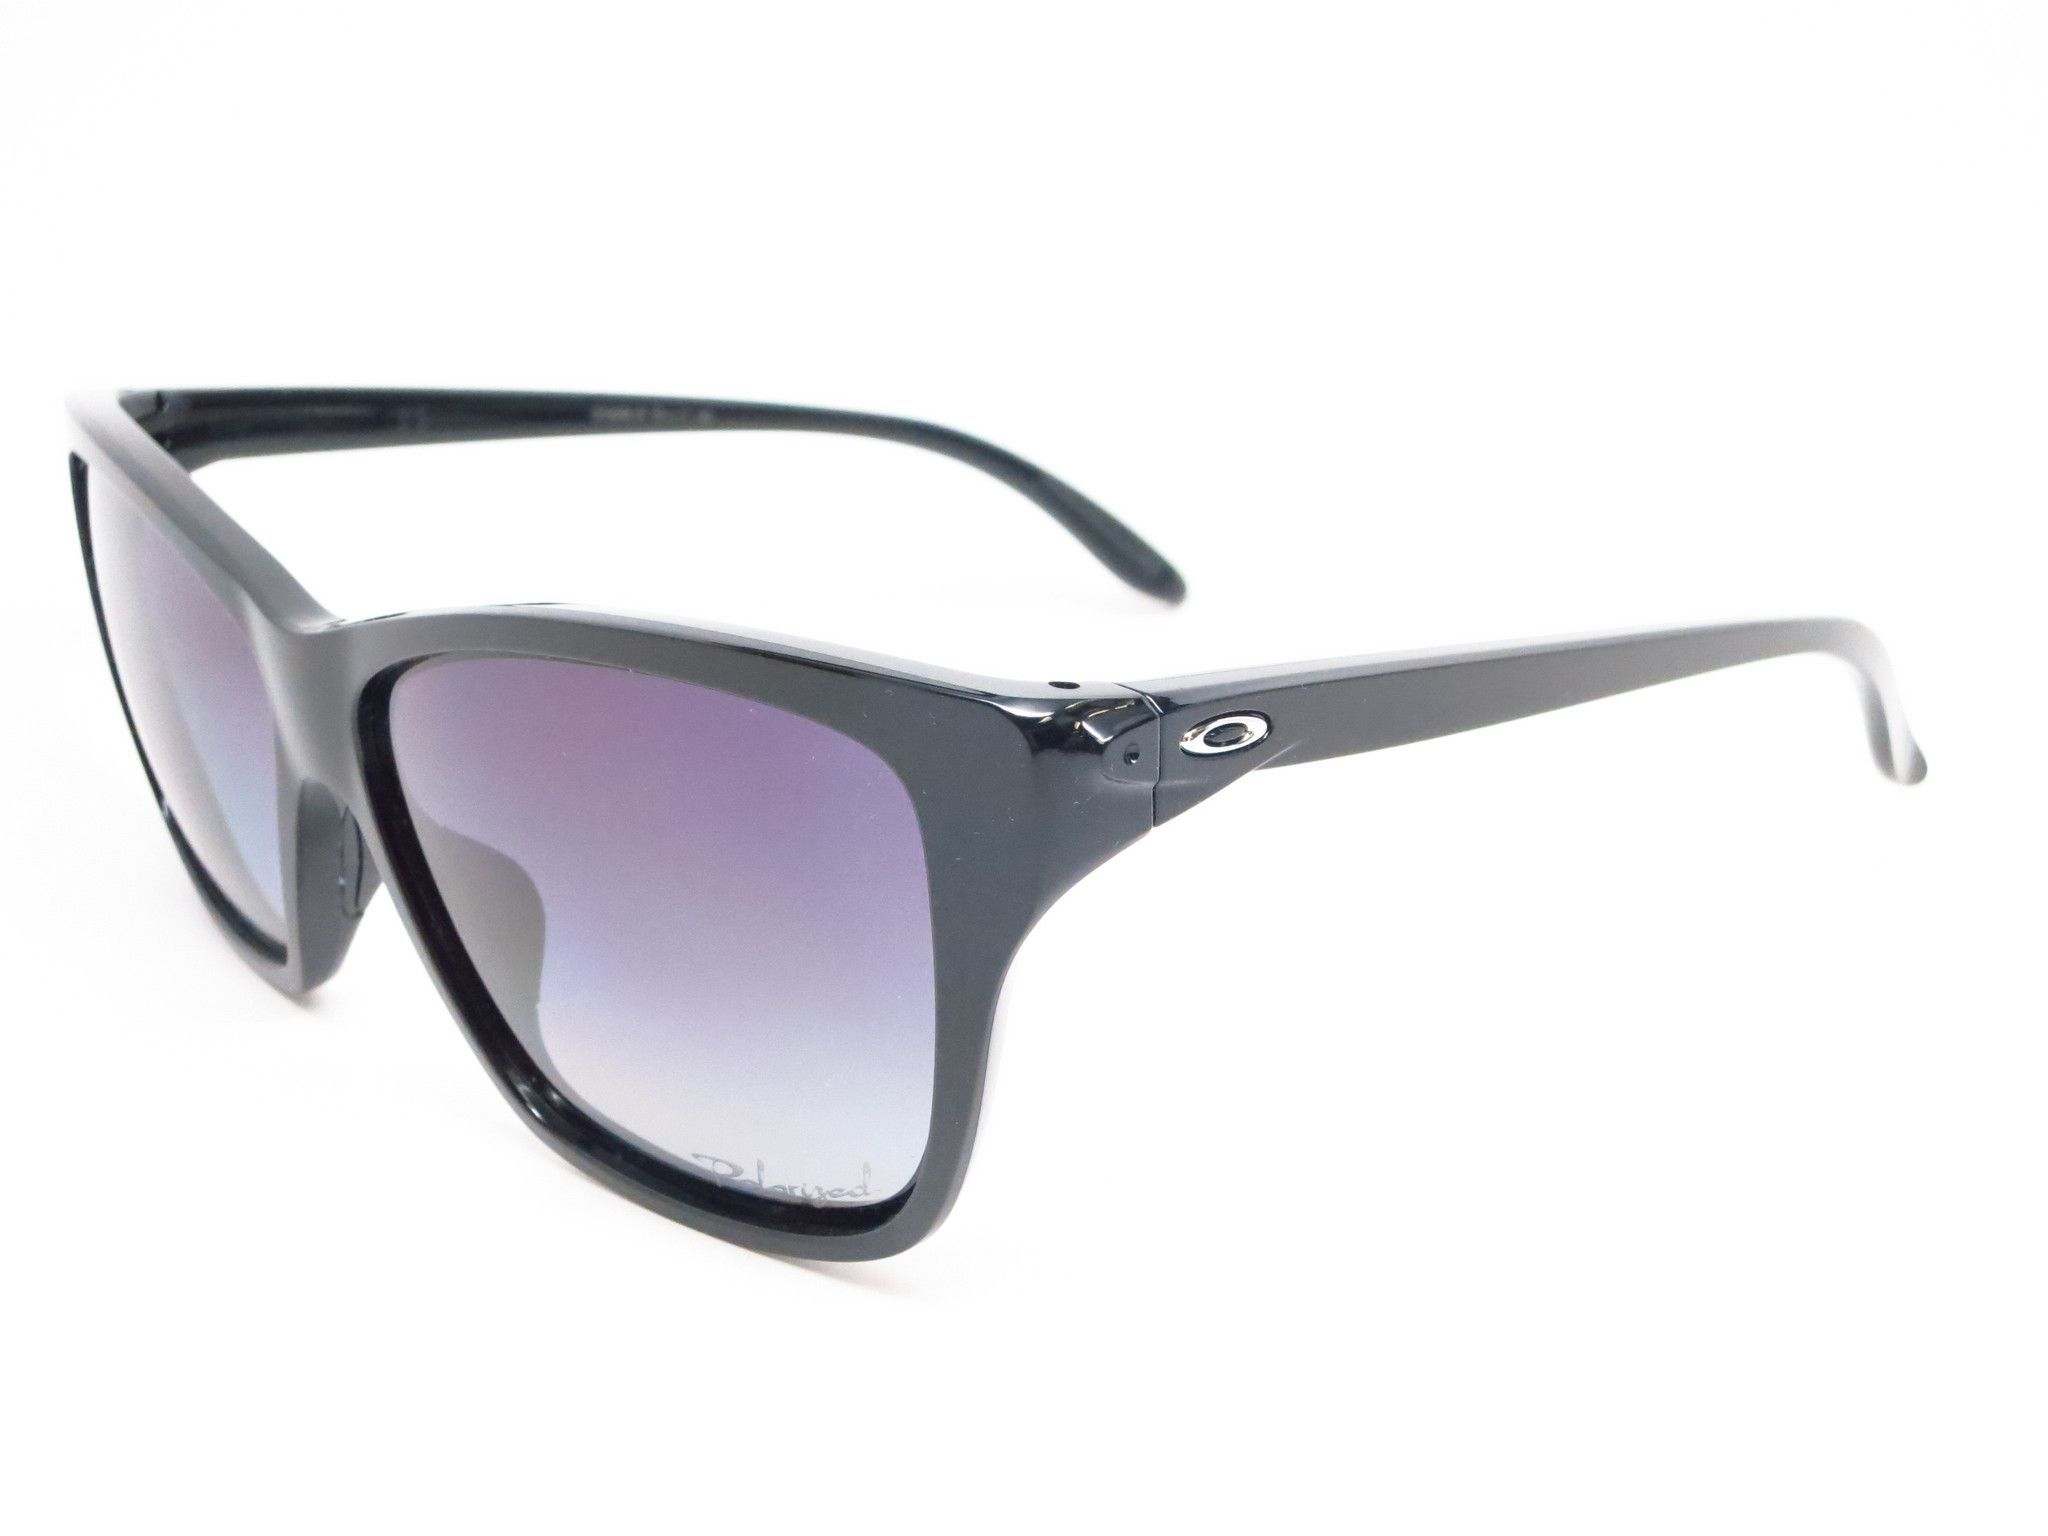 6c54ba19a377c Oakley Hold On OO9298-06 Polished Black Polarized Sunglasses ...